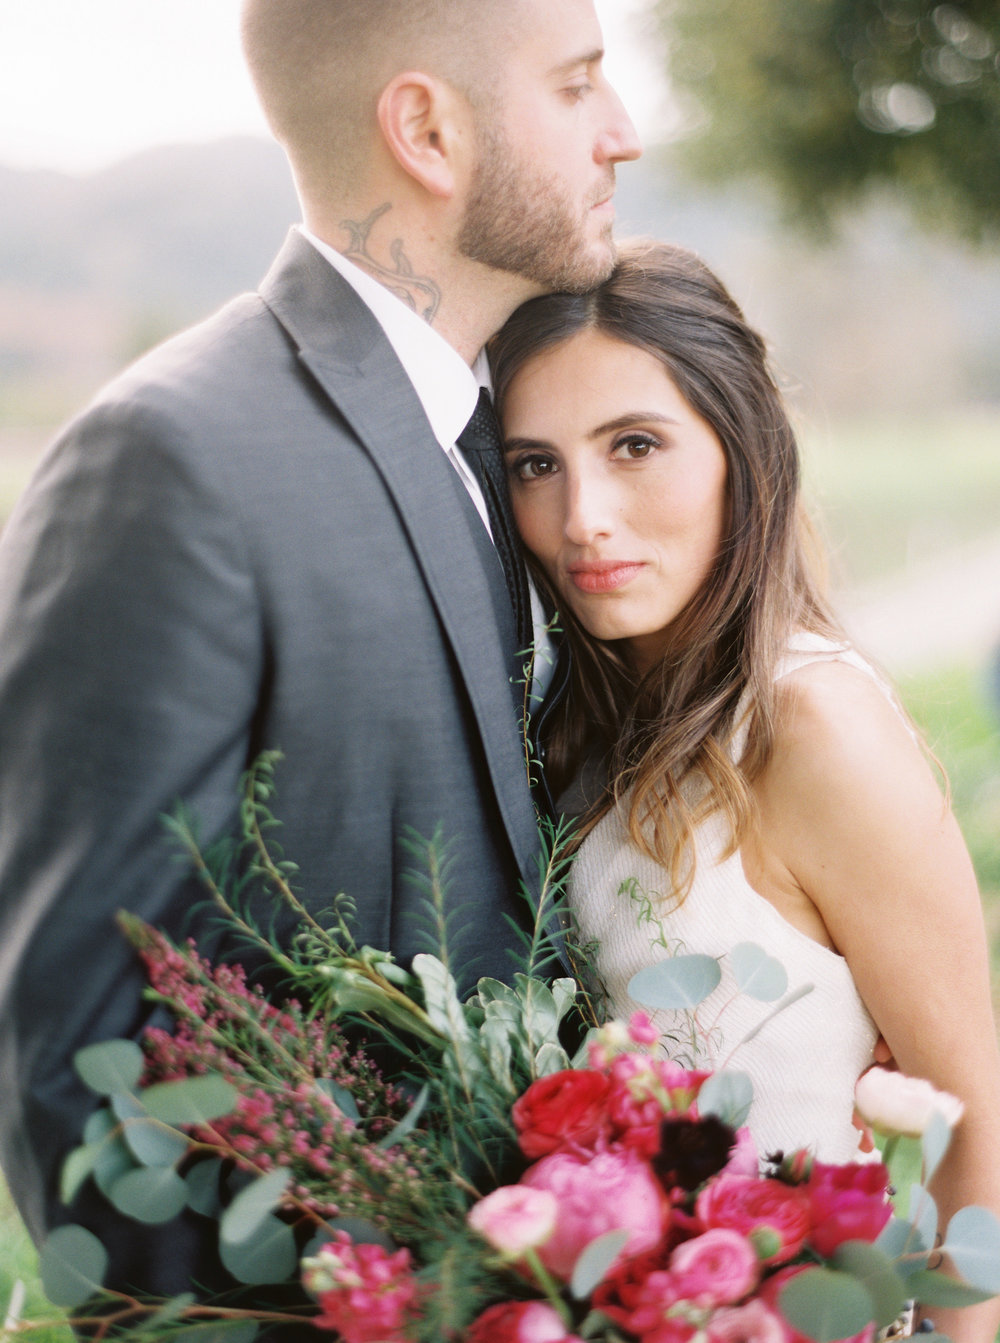 boho-inspired-wedding-at-casa-bella-in-sunol-california-45.jpg